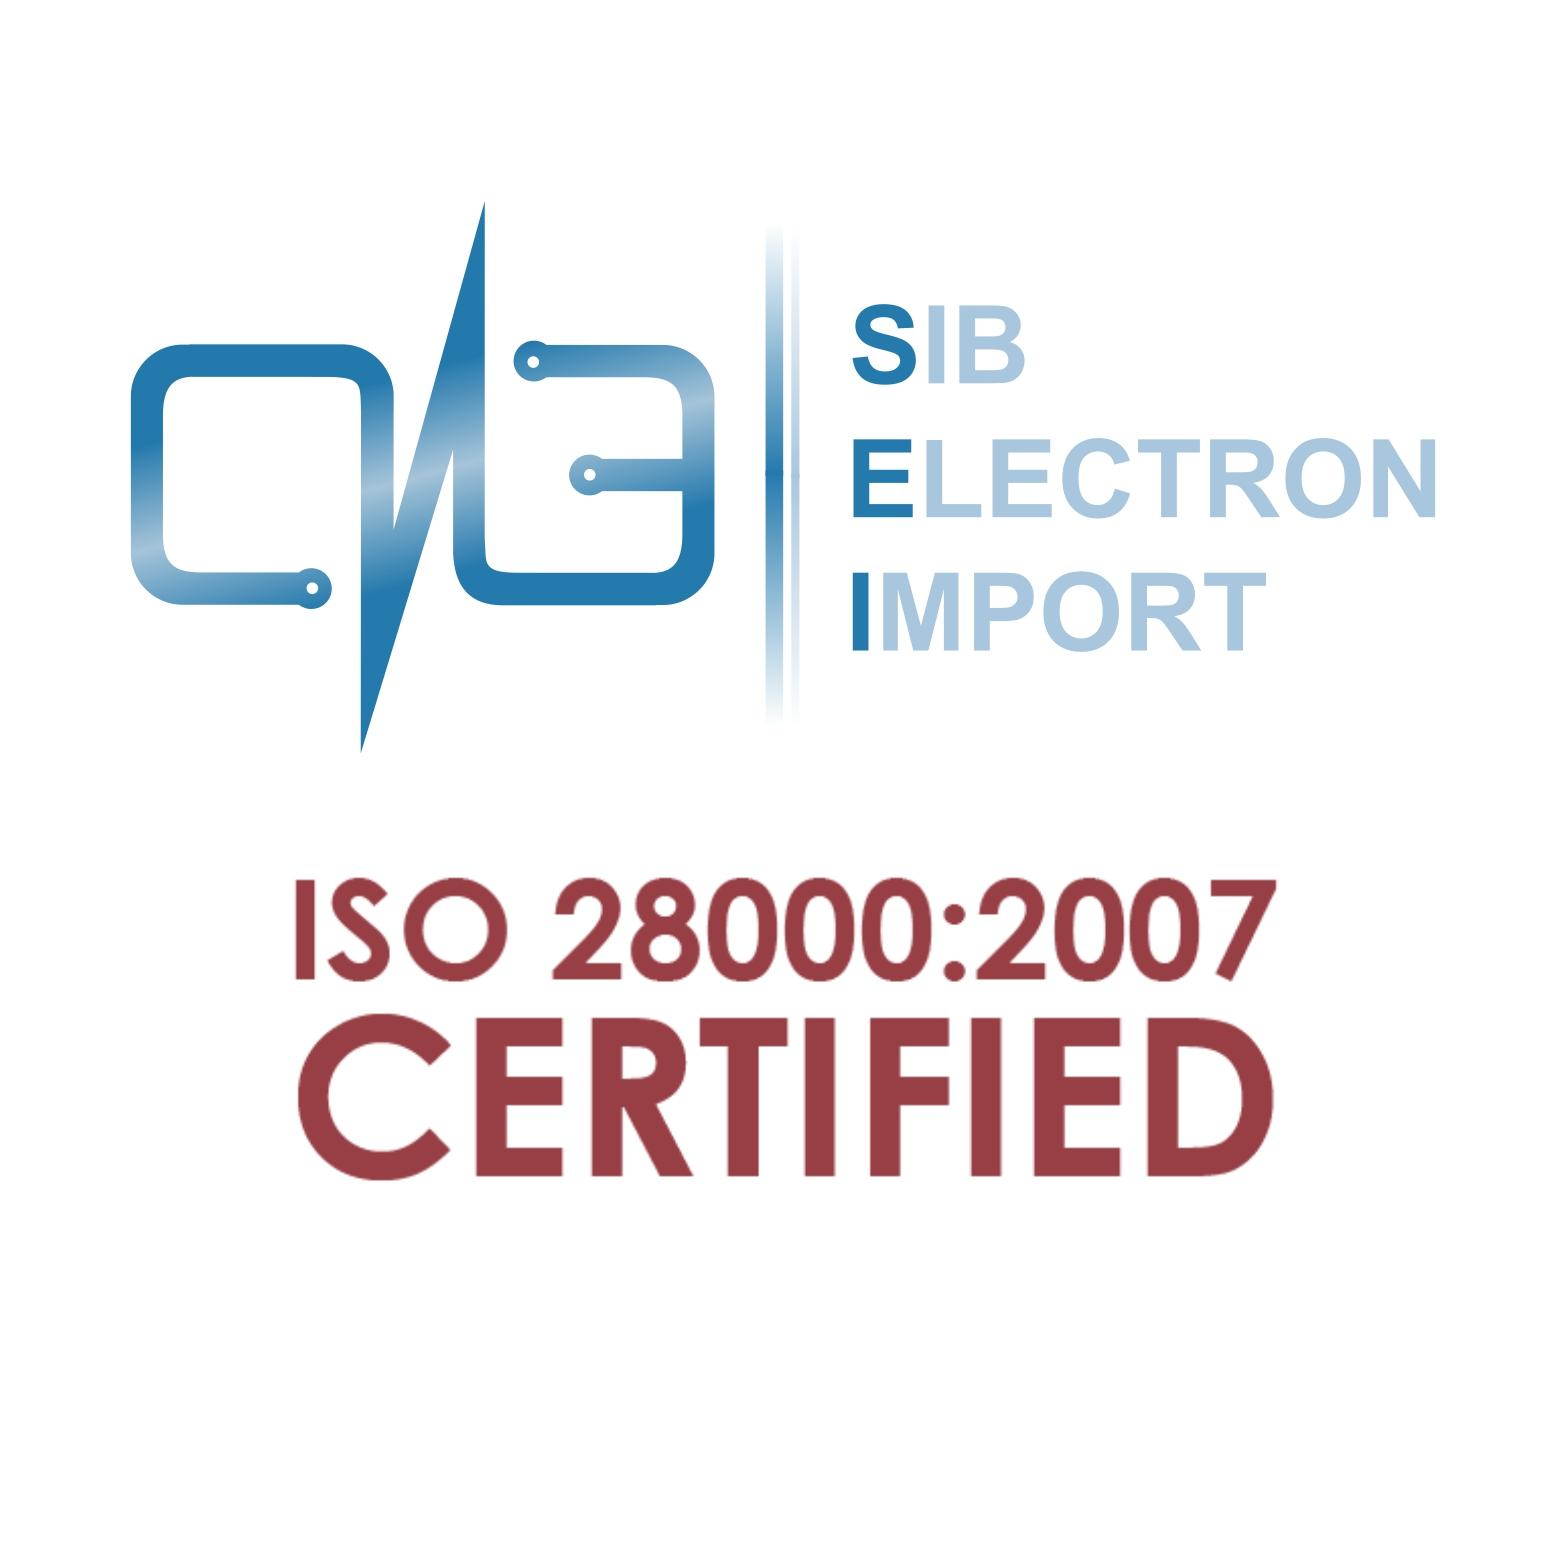 Компания Сибэлектронимпорт прошла сертификацию ISO 28000:2007